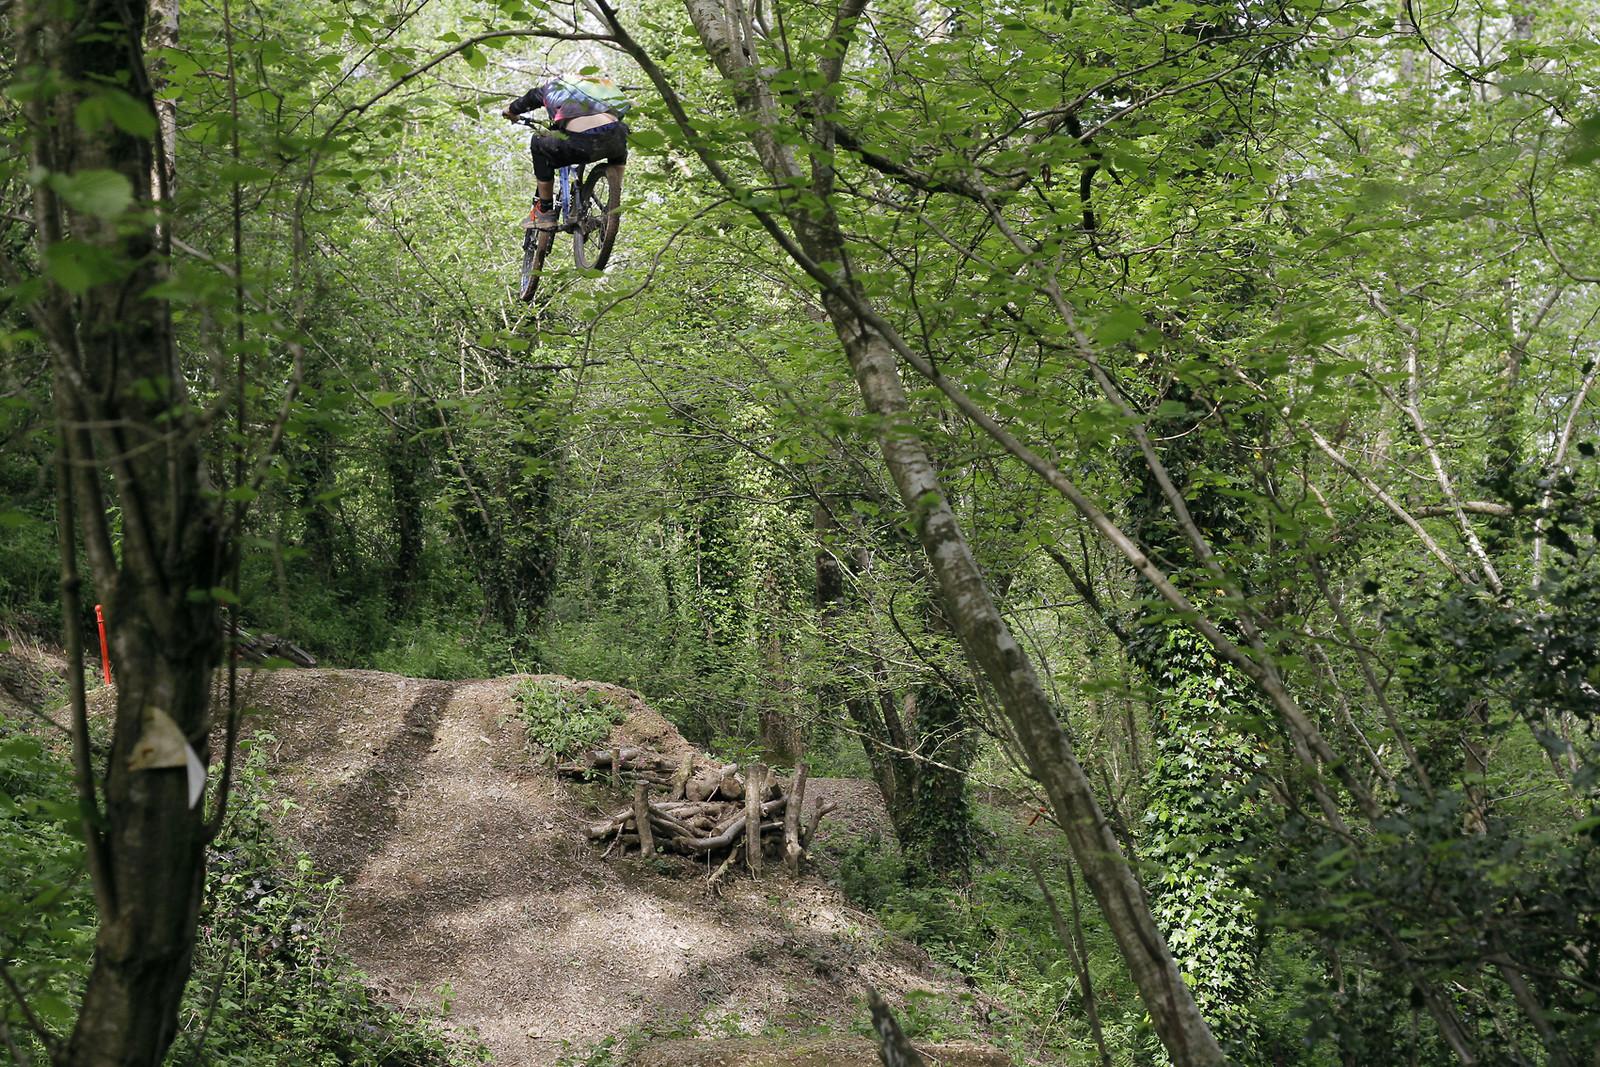 To the moon boi! - CaldwellVisuals - Mountain Biking Pictures - Vital MTB